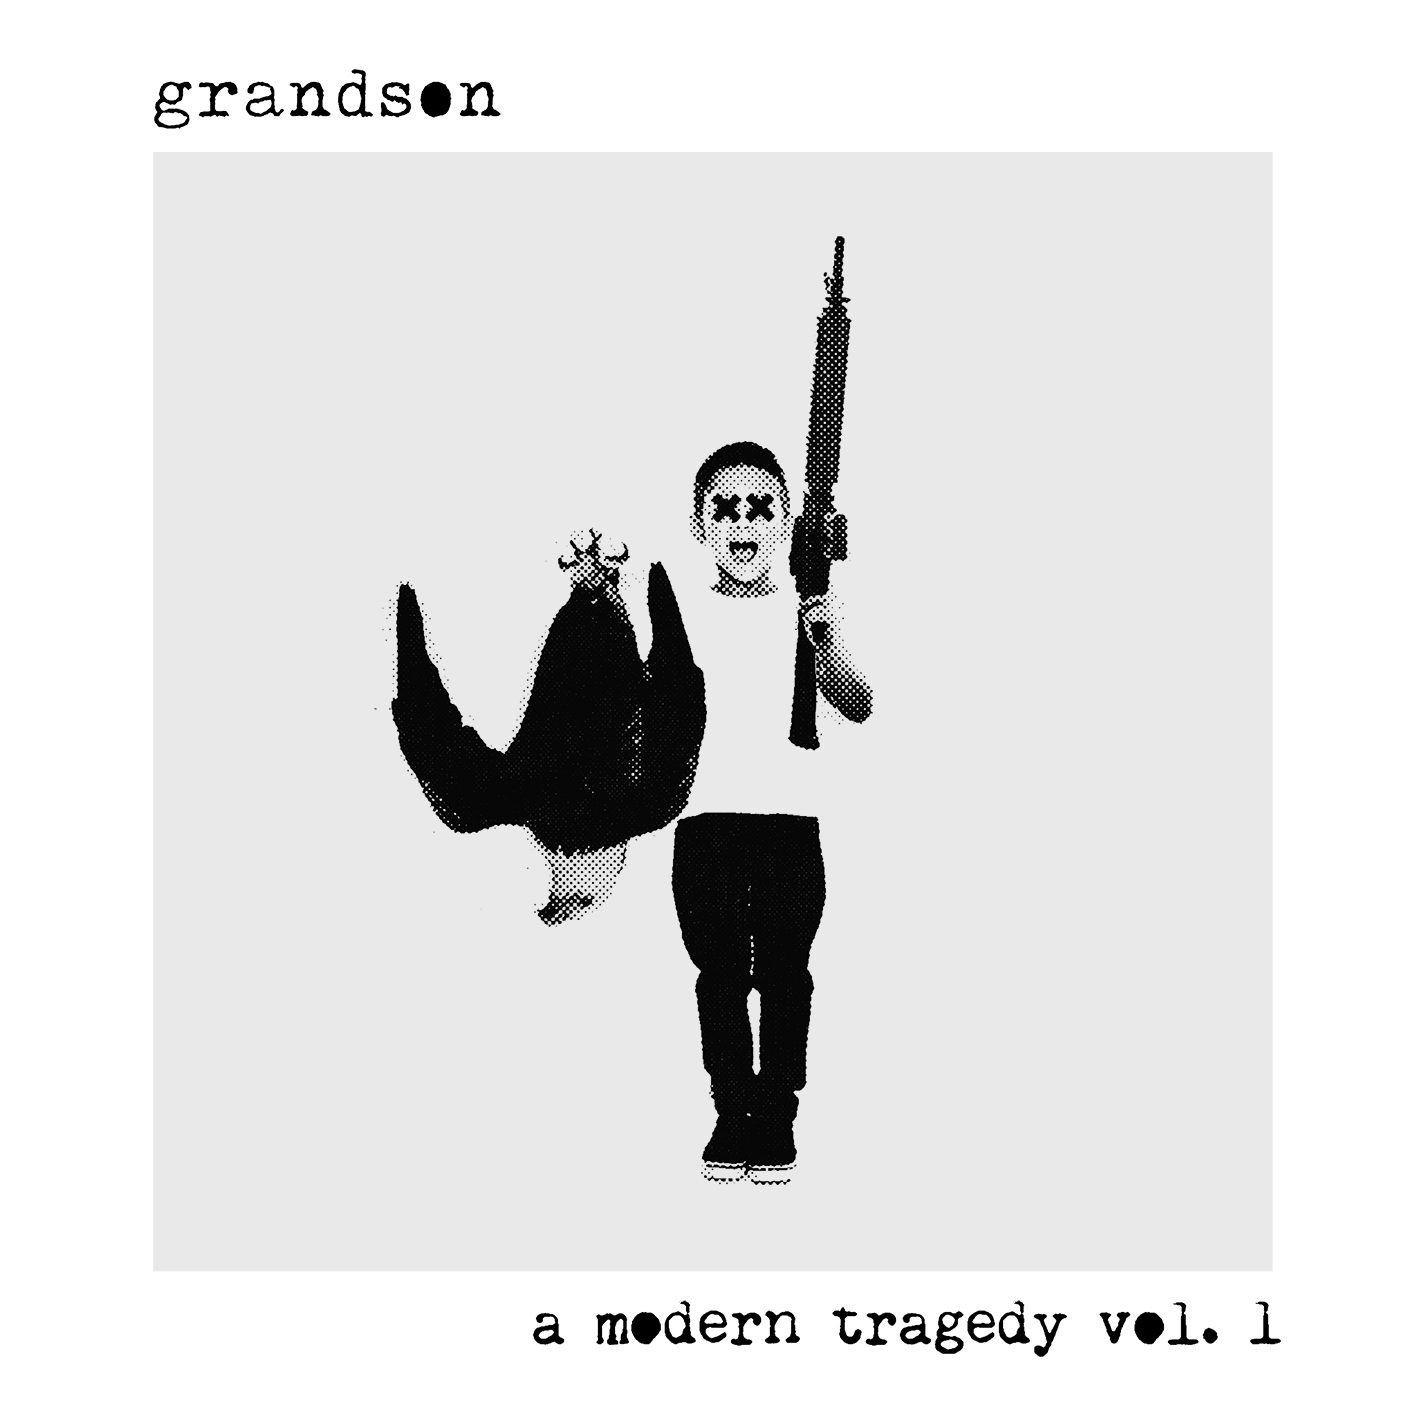 grandson 's Unique Sound Shines In   a modern tragedy vol. 1